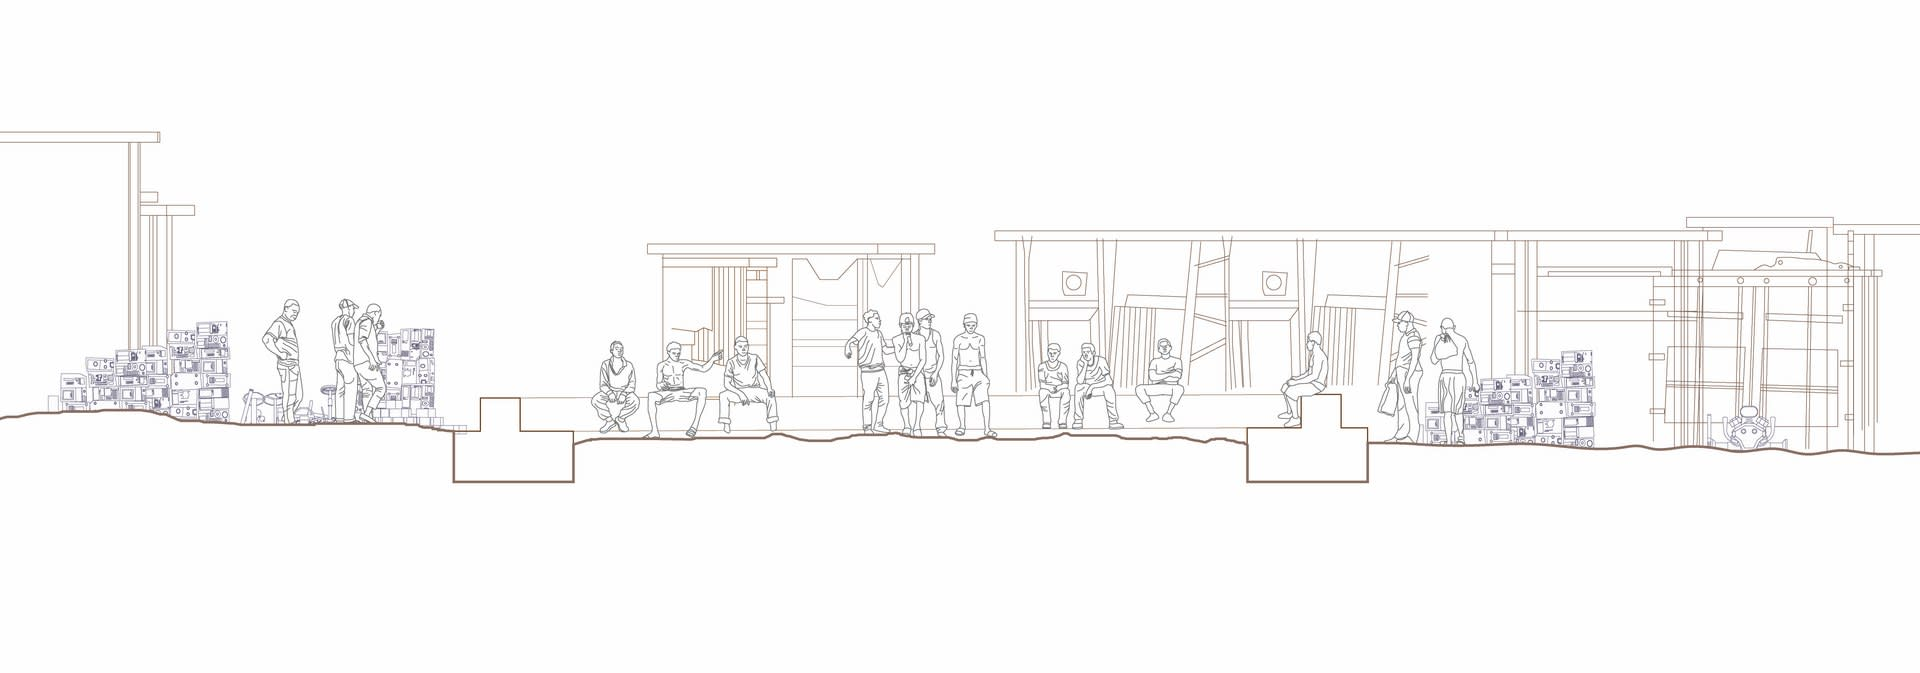 Frame Plinth - Illustrative cross section